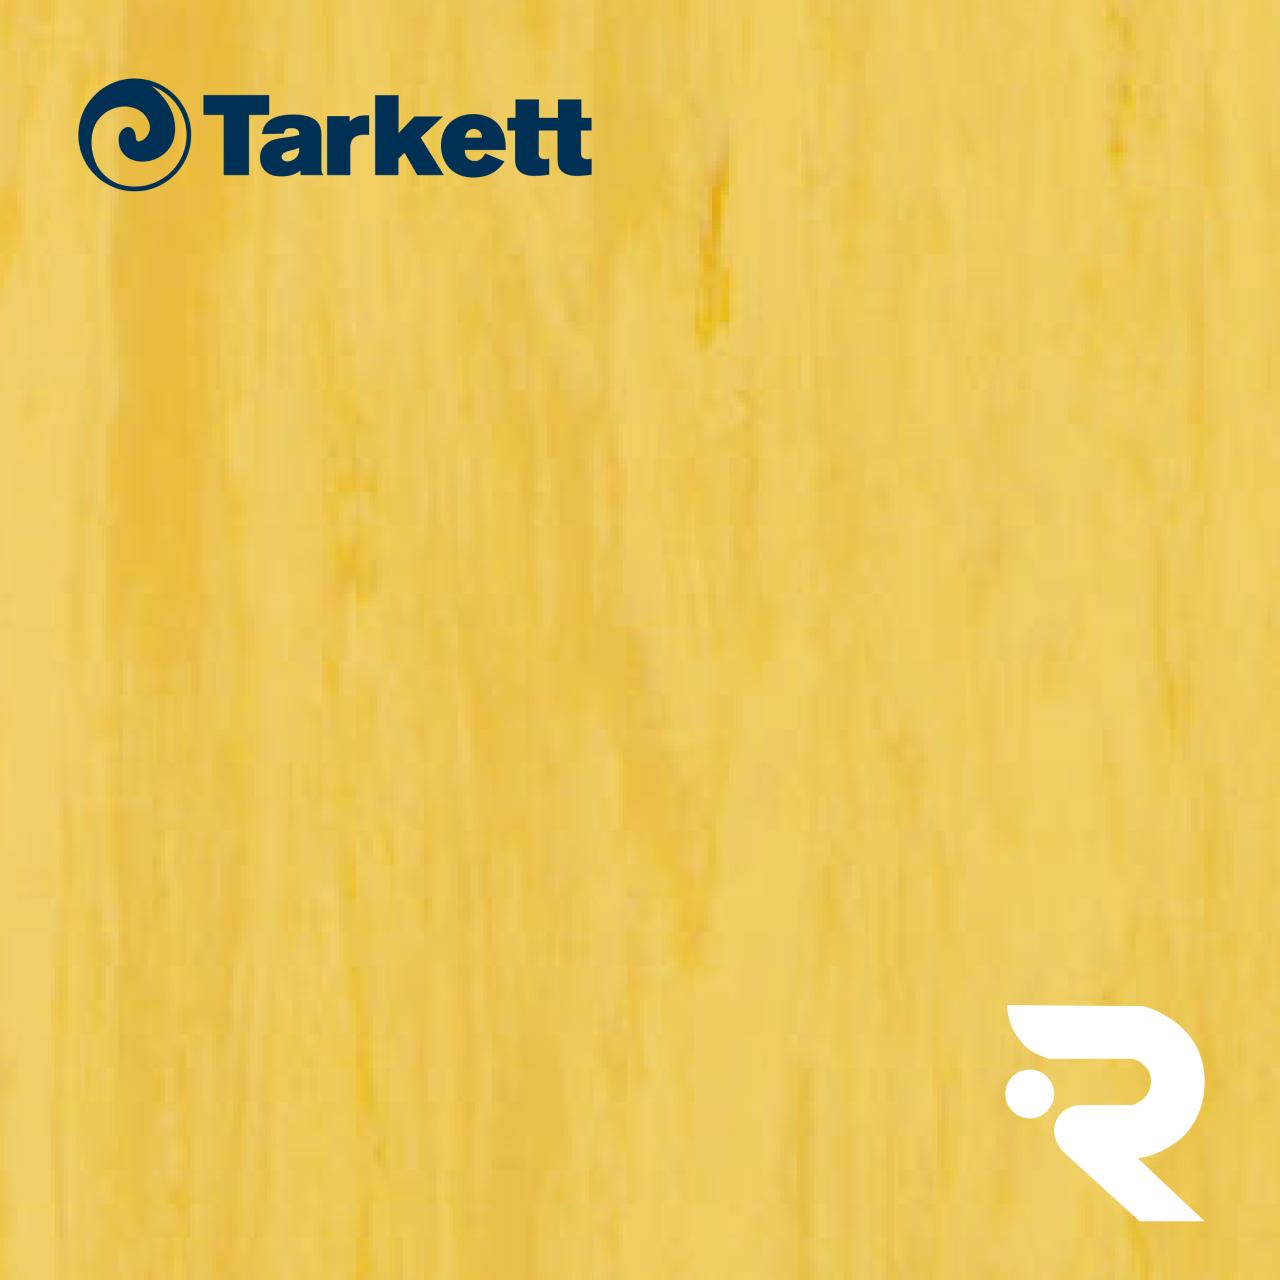 🏫 Гомогенный линолеум Tarkett | Standard GOLD 0916 | Standard Plus 2.0 mm | 2 х 23 м